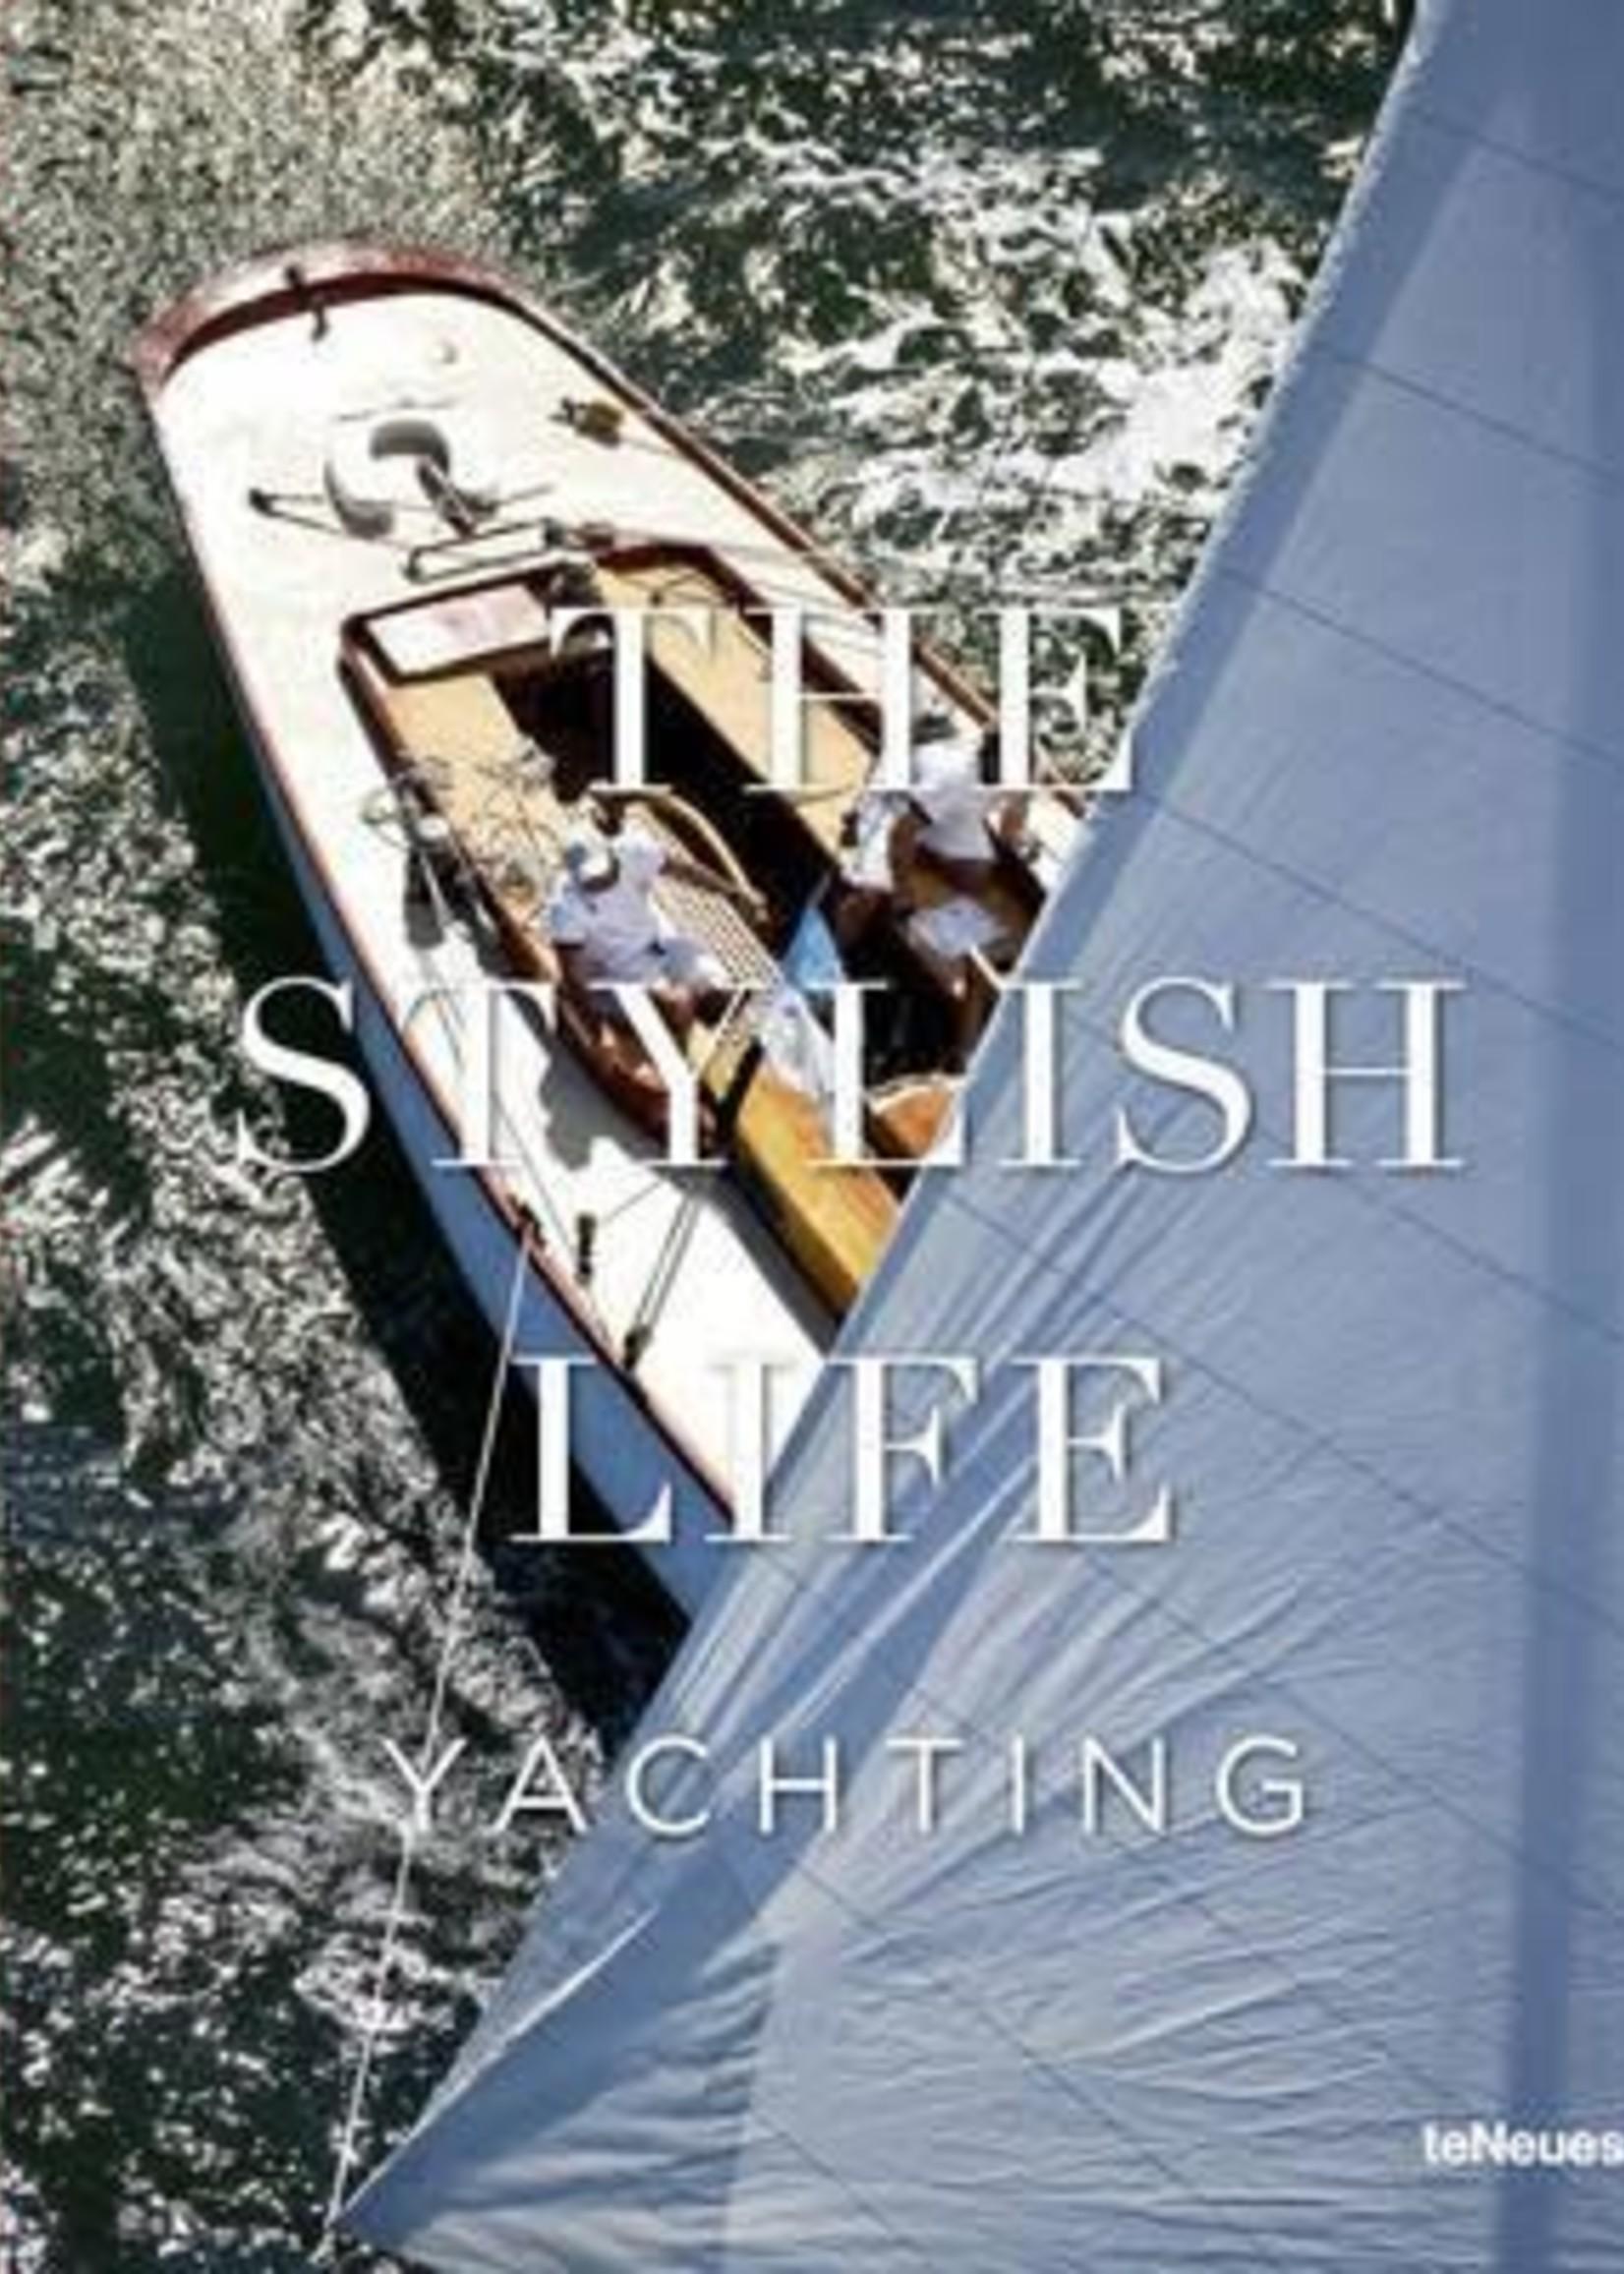 teNeues TeNeues Stylish Life: Yachting